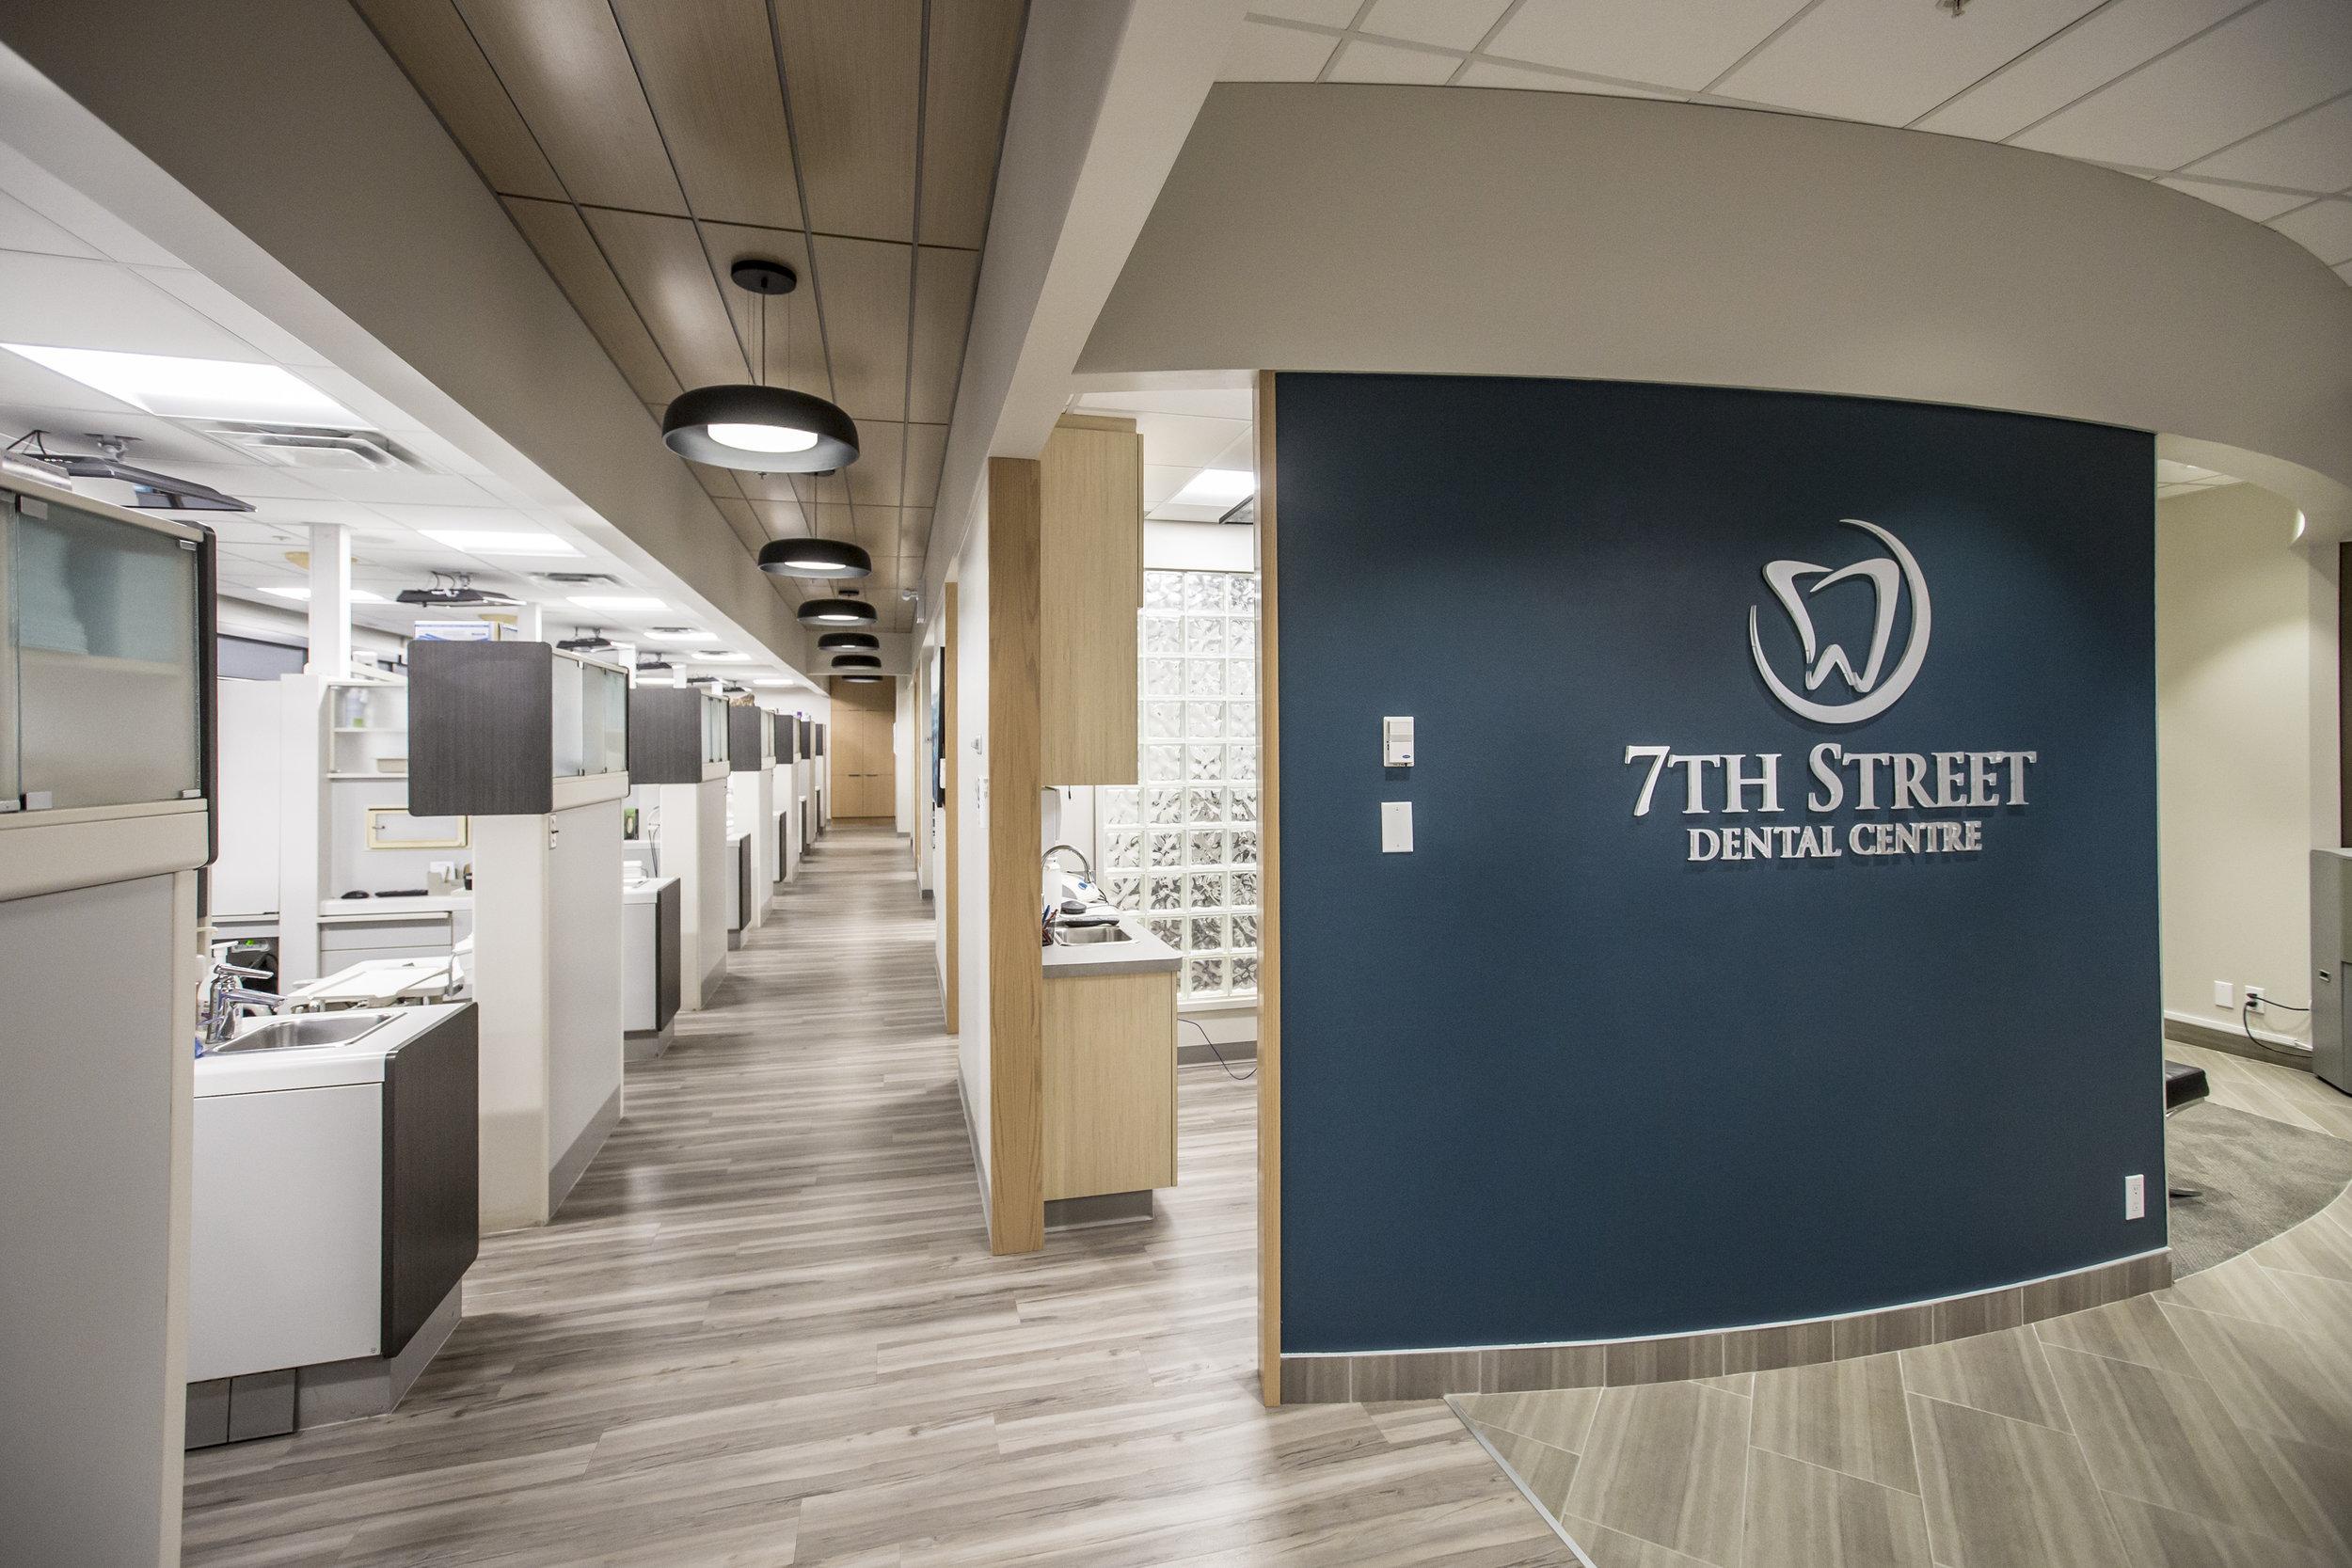 7th Street Dental